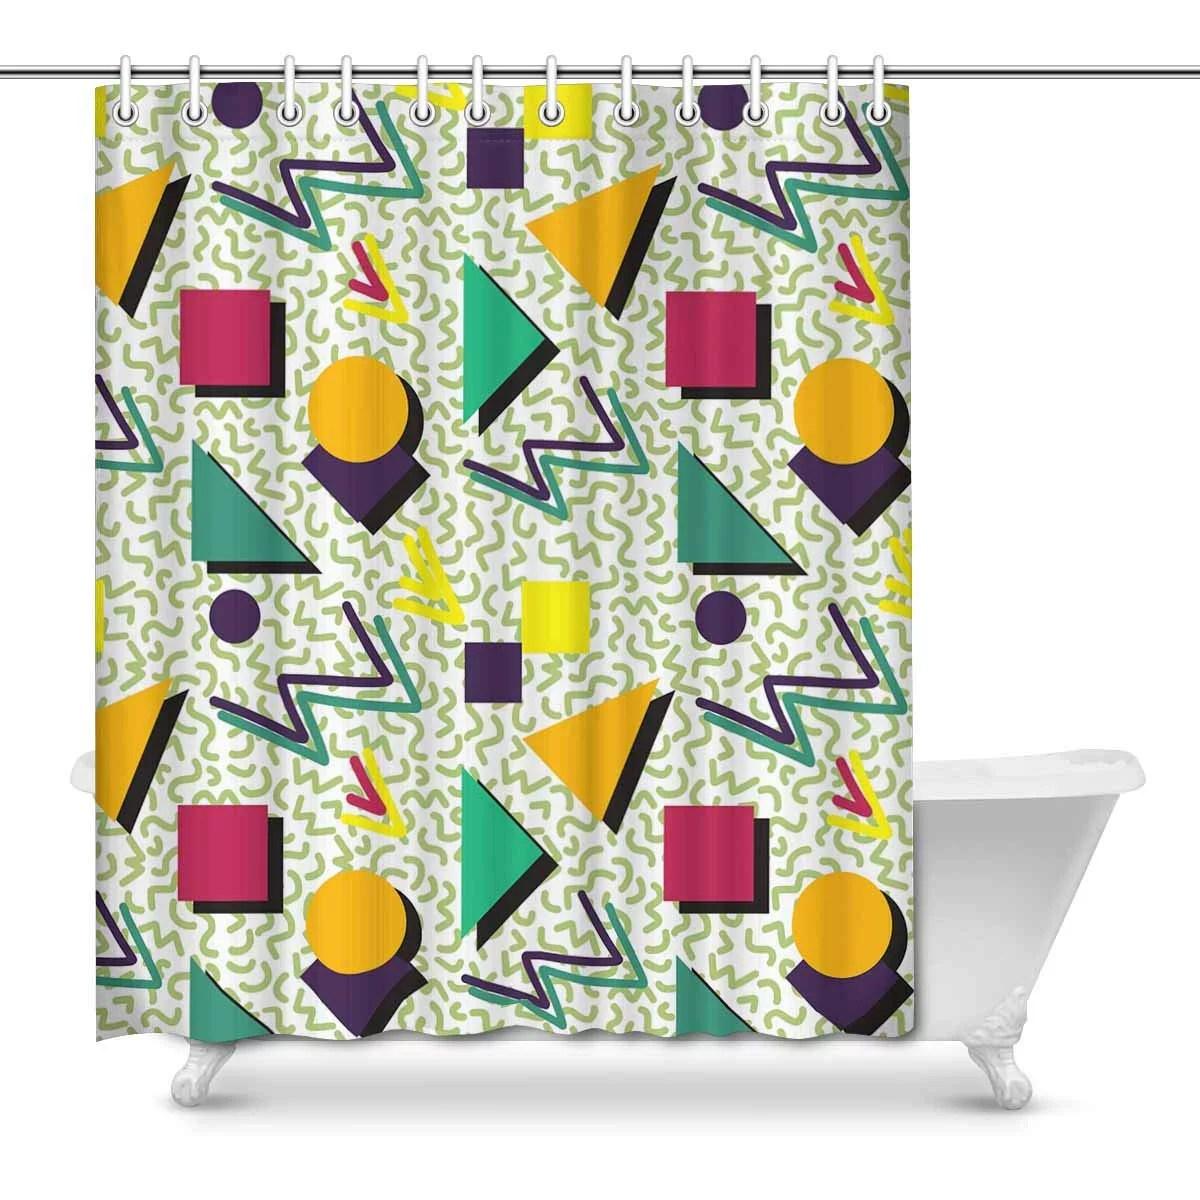 mkhert geometric pattern in retro 80s style memphis abstract modern house decor shower curtain bathroom decorative fabric bath curtain set rings 66x72